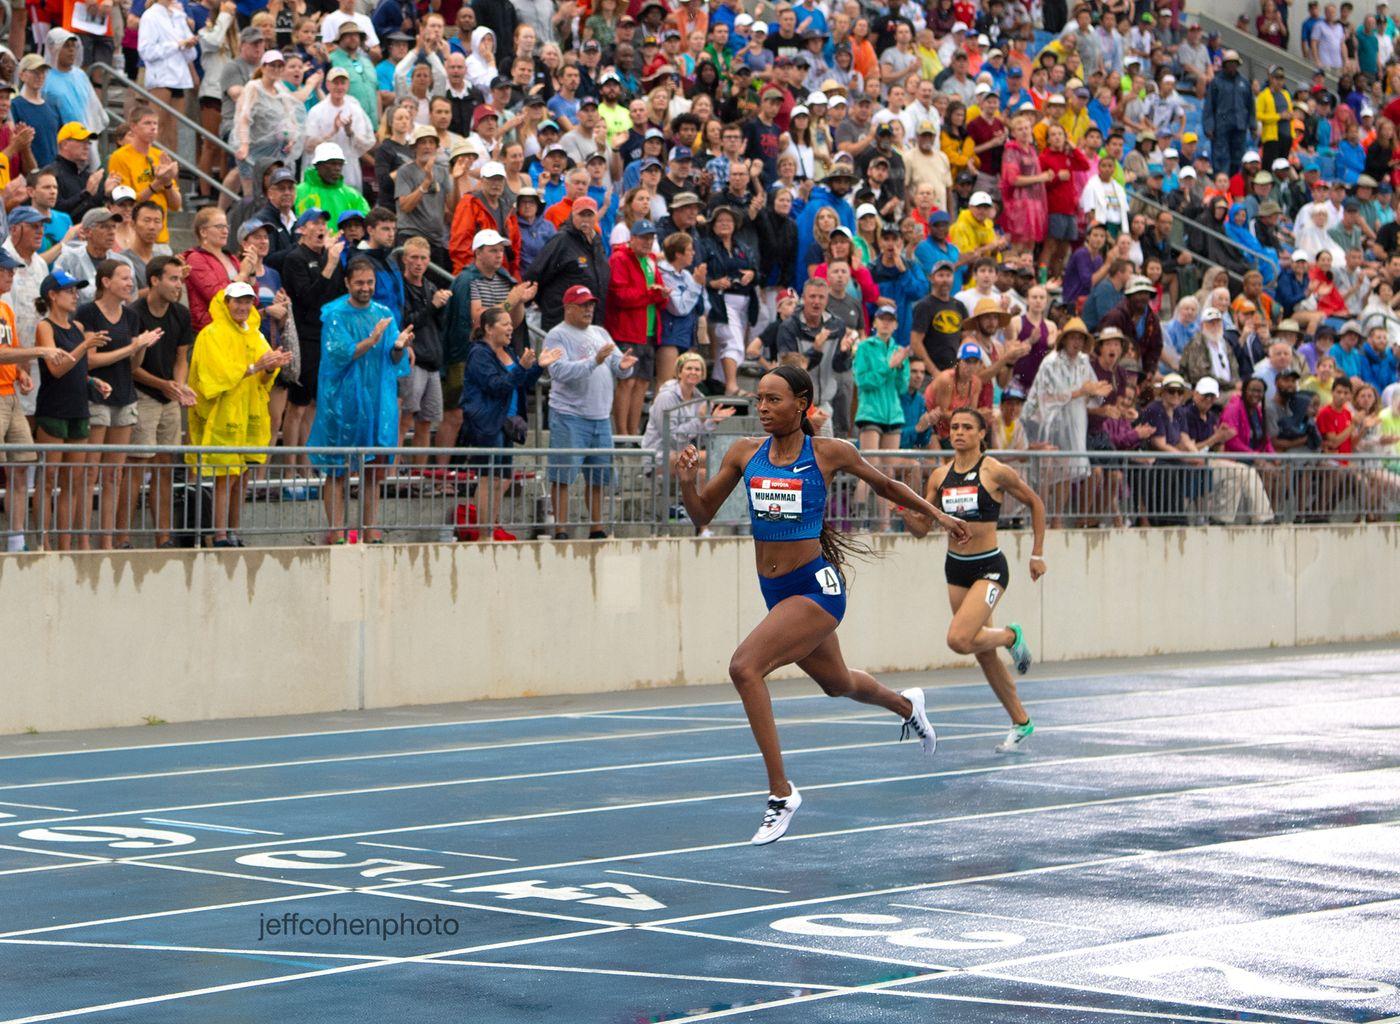 Dalilah Muhammad, WORLD RECORD, 400 meter hurdles . 2019 Toyota USATF Outdoor Championships, Des Moines, Iowa. July 28, 2019